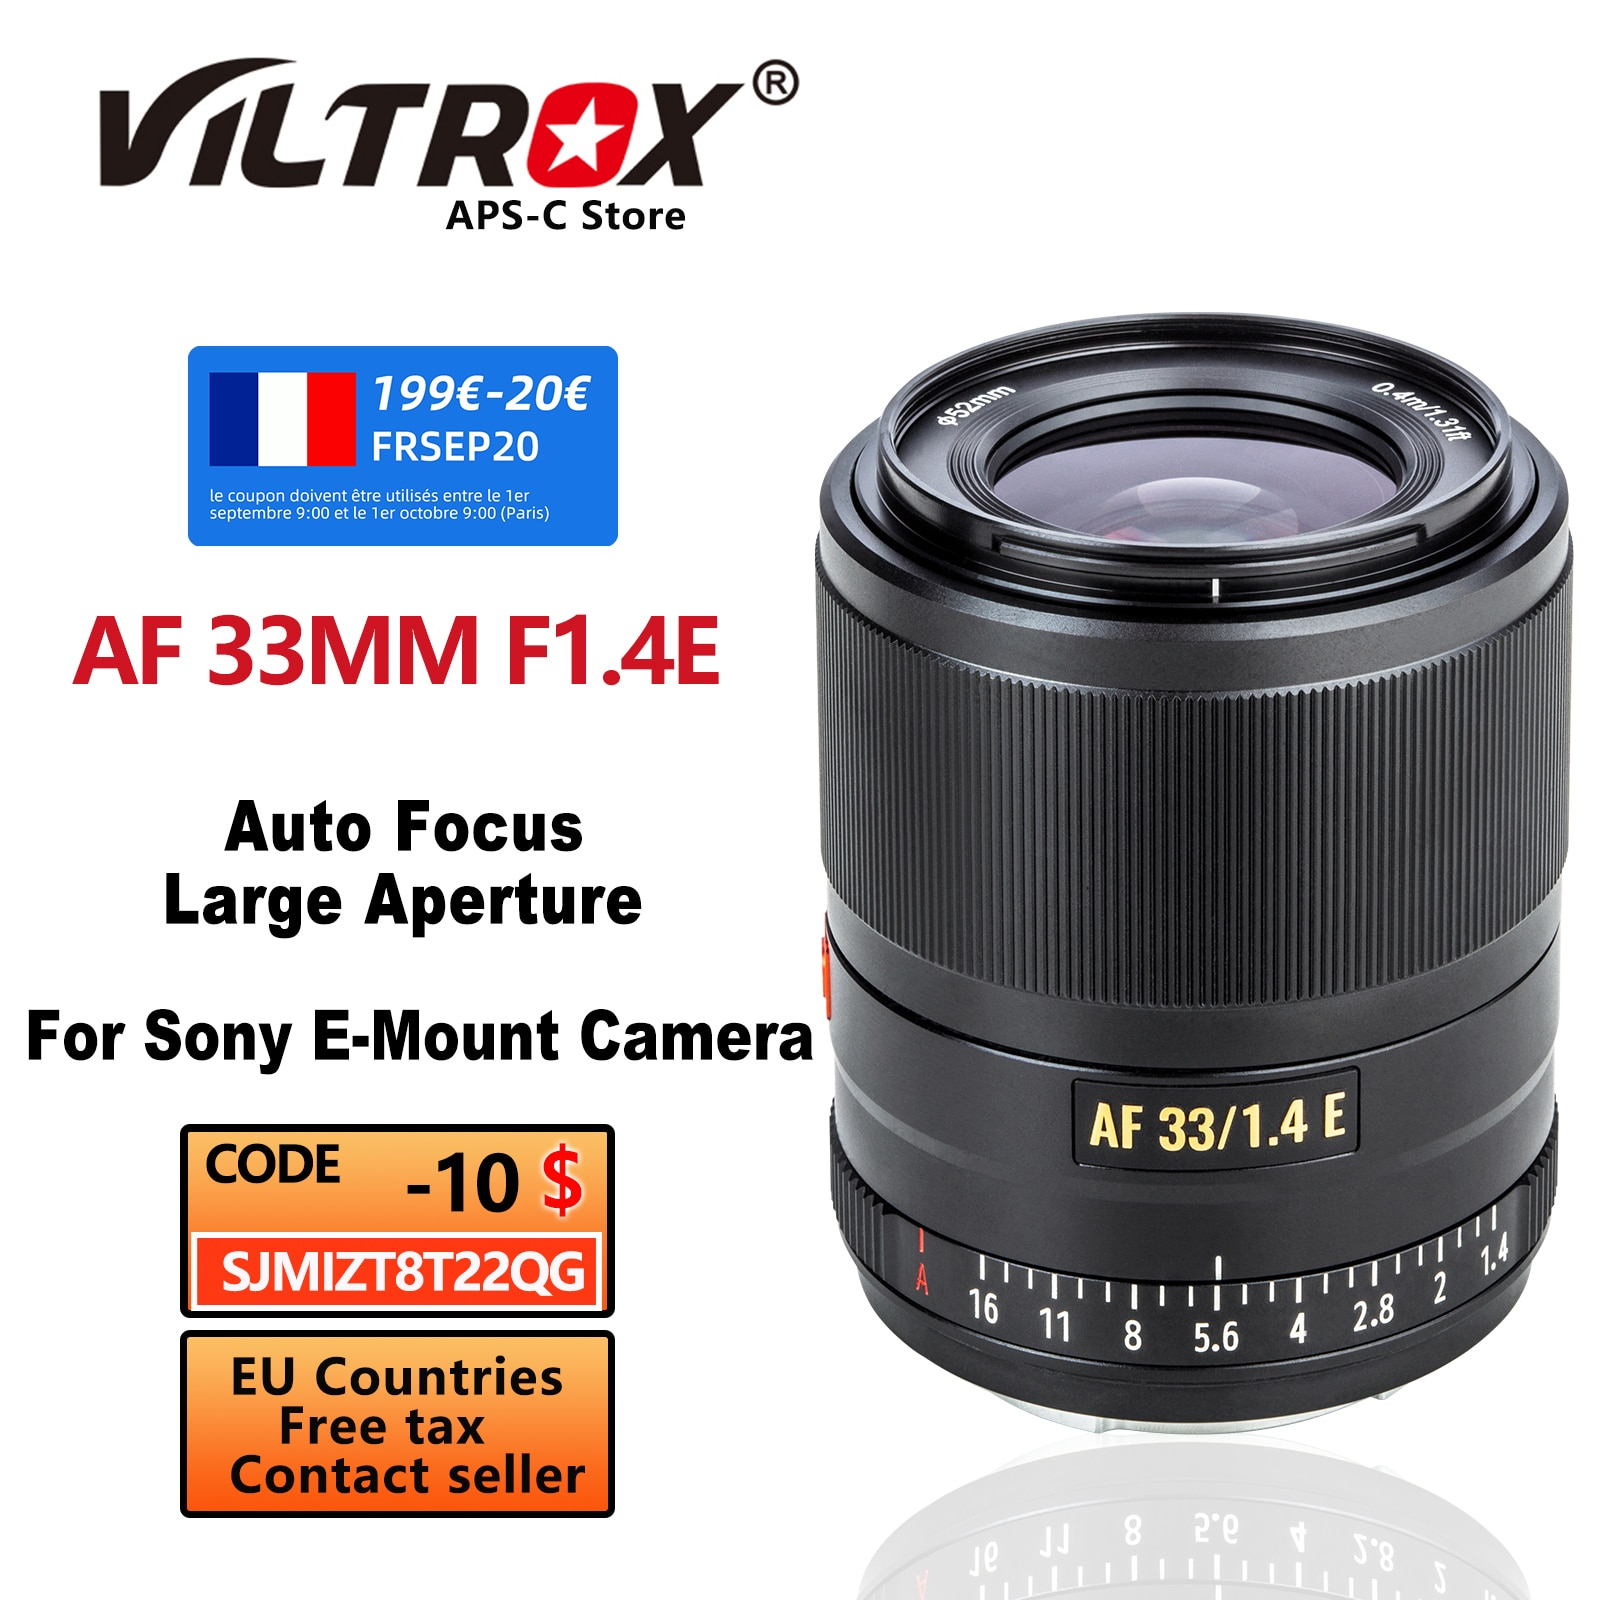 VILTROX 33 مللي متر f1.4 E AF السيارات التركيز عدسة الكاميرا المدمجة عدسة كبيرة APS-C لسوني E-mount A6600 A6500 A9 A7RIV A7II A7S